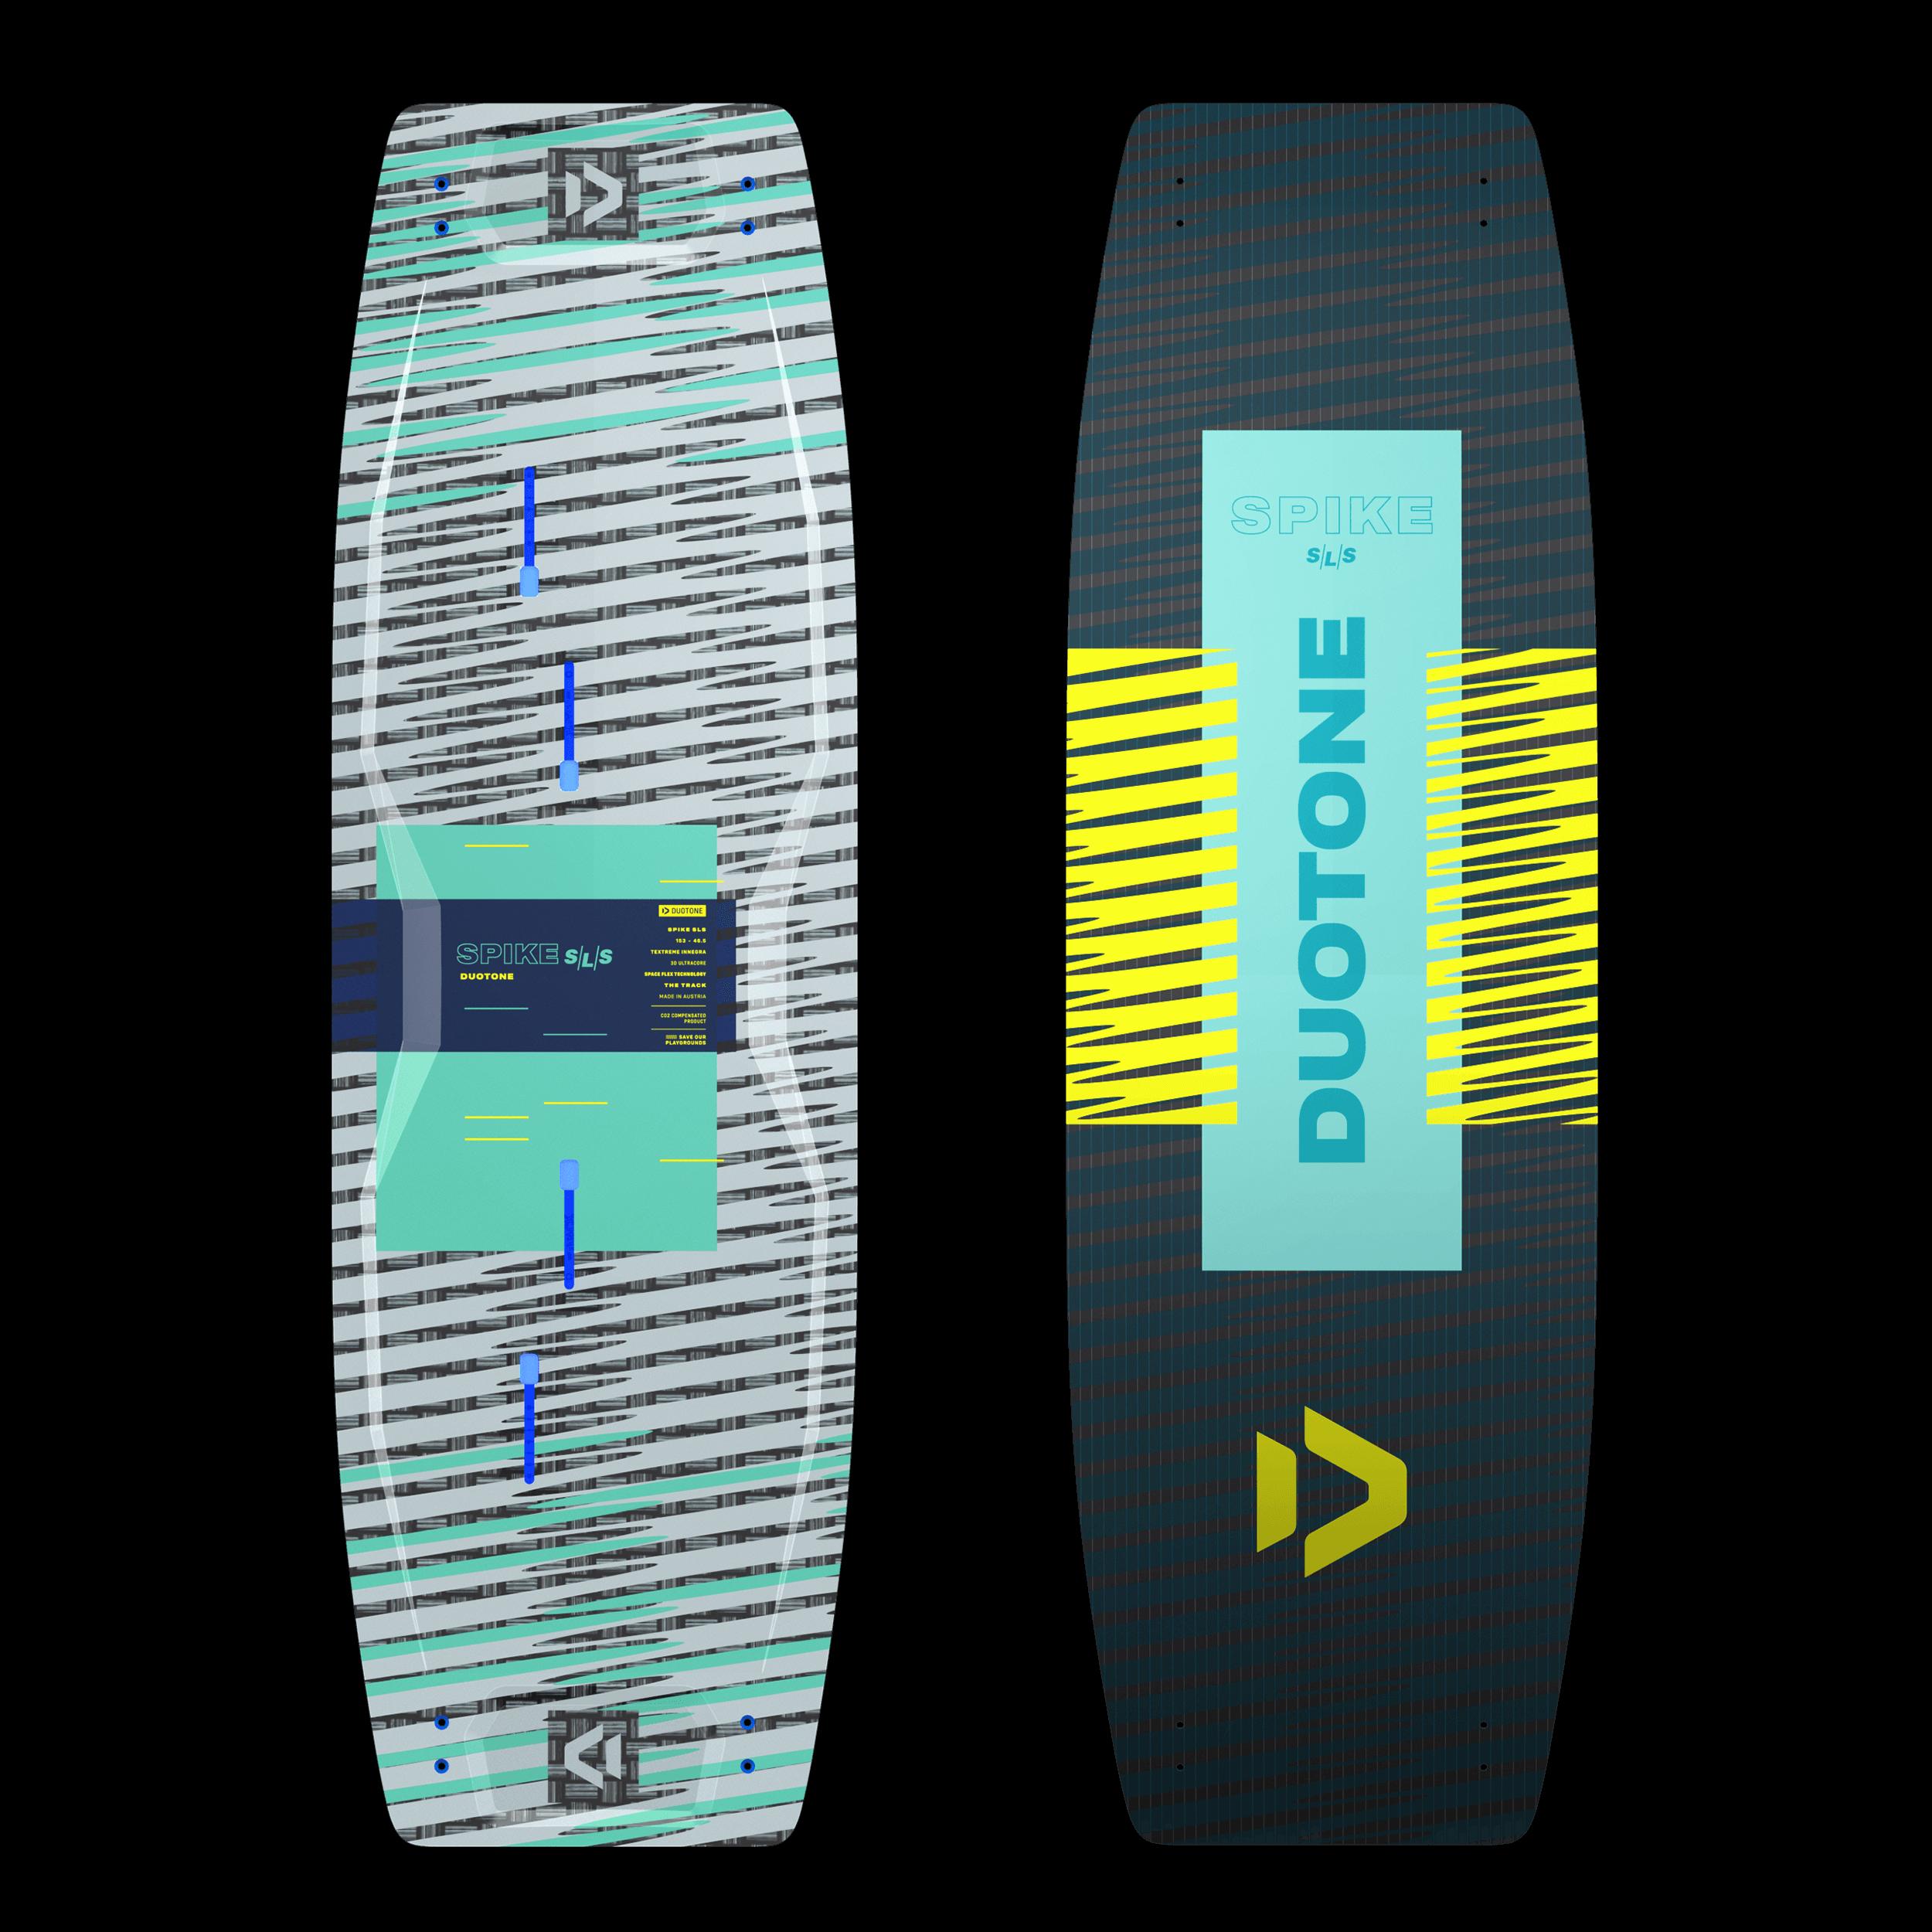 duotone kiteboarding spike sls tech features